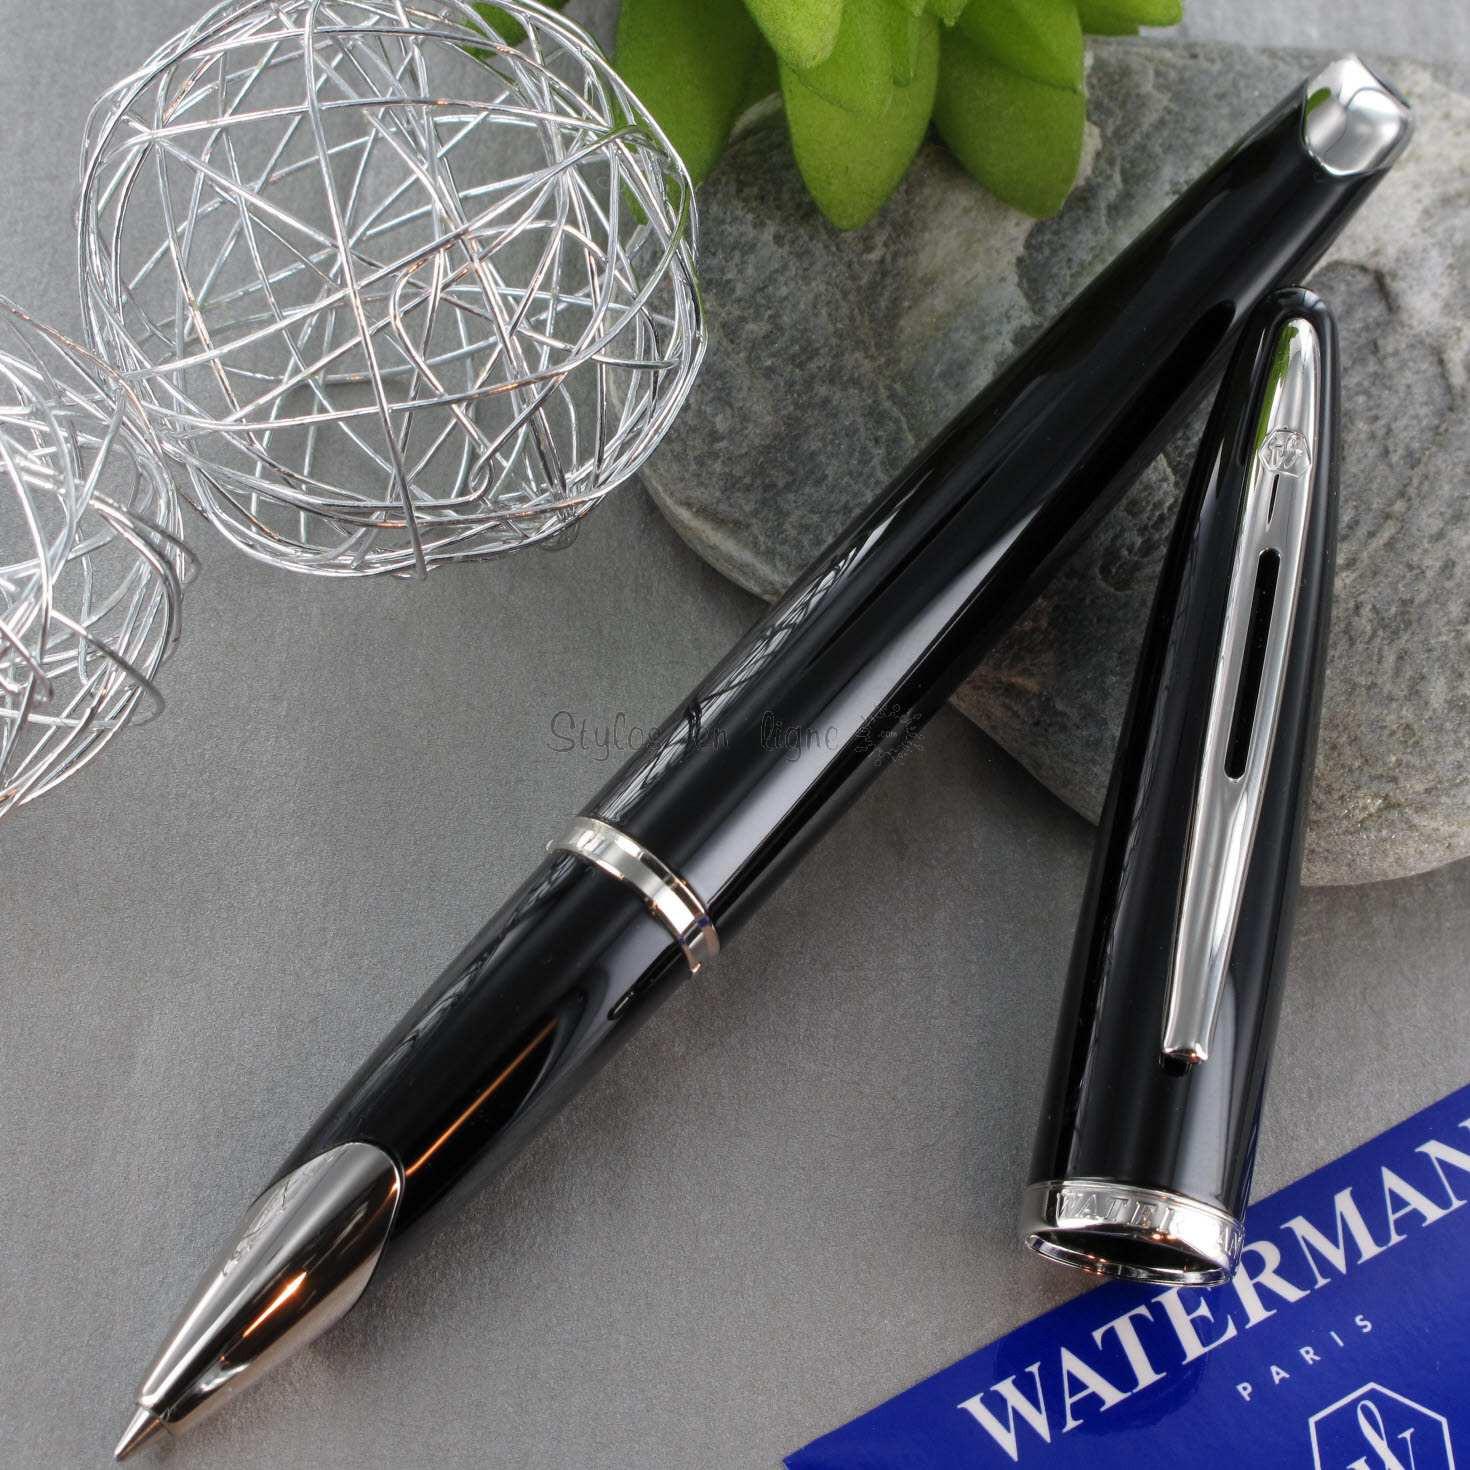 stylo 4 couleurs waterman